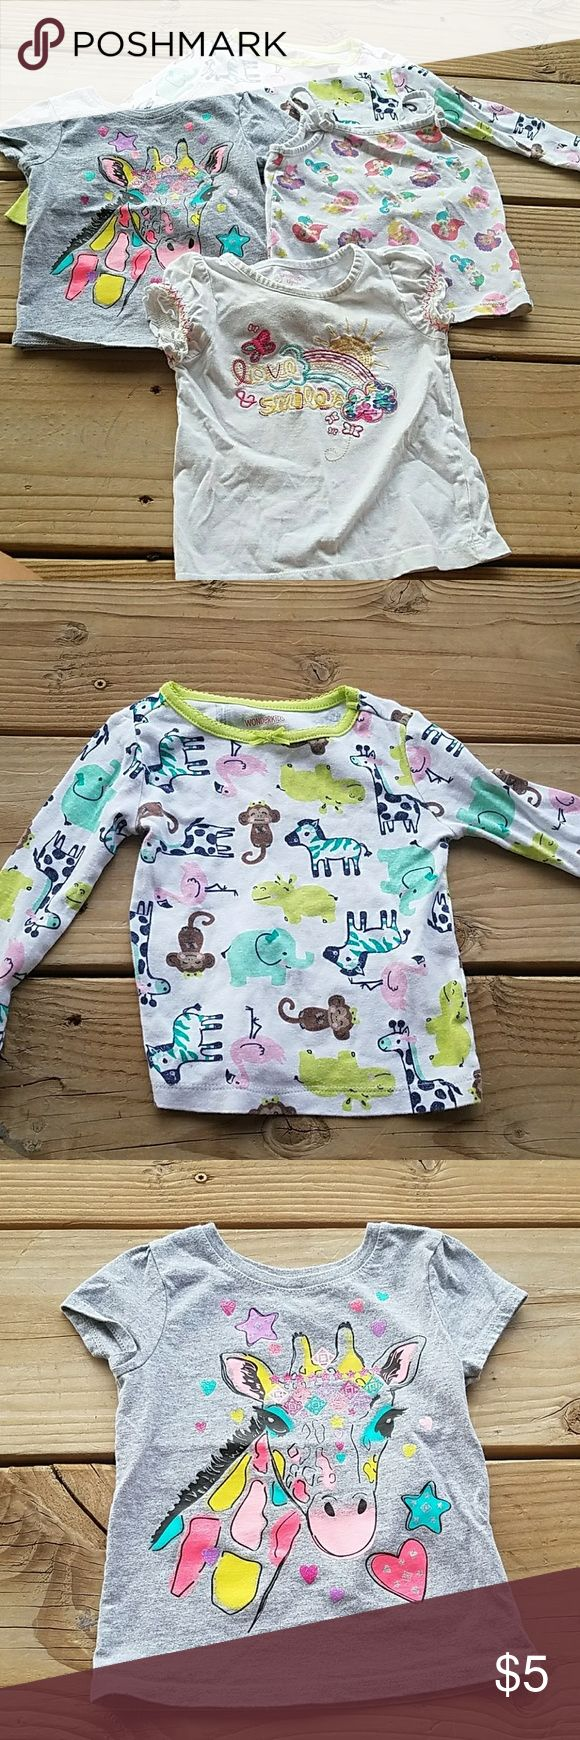 2t Toddler Bundle. 4 Shirts Wonderkids animal long sleeve pajama shirt, Garanimals grey giraffe shirt, Wonderkids mermaid top, OshKosh B'gosh white love and smiles shirt Shirts & Tops